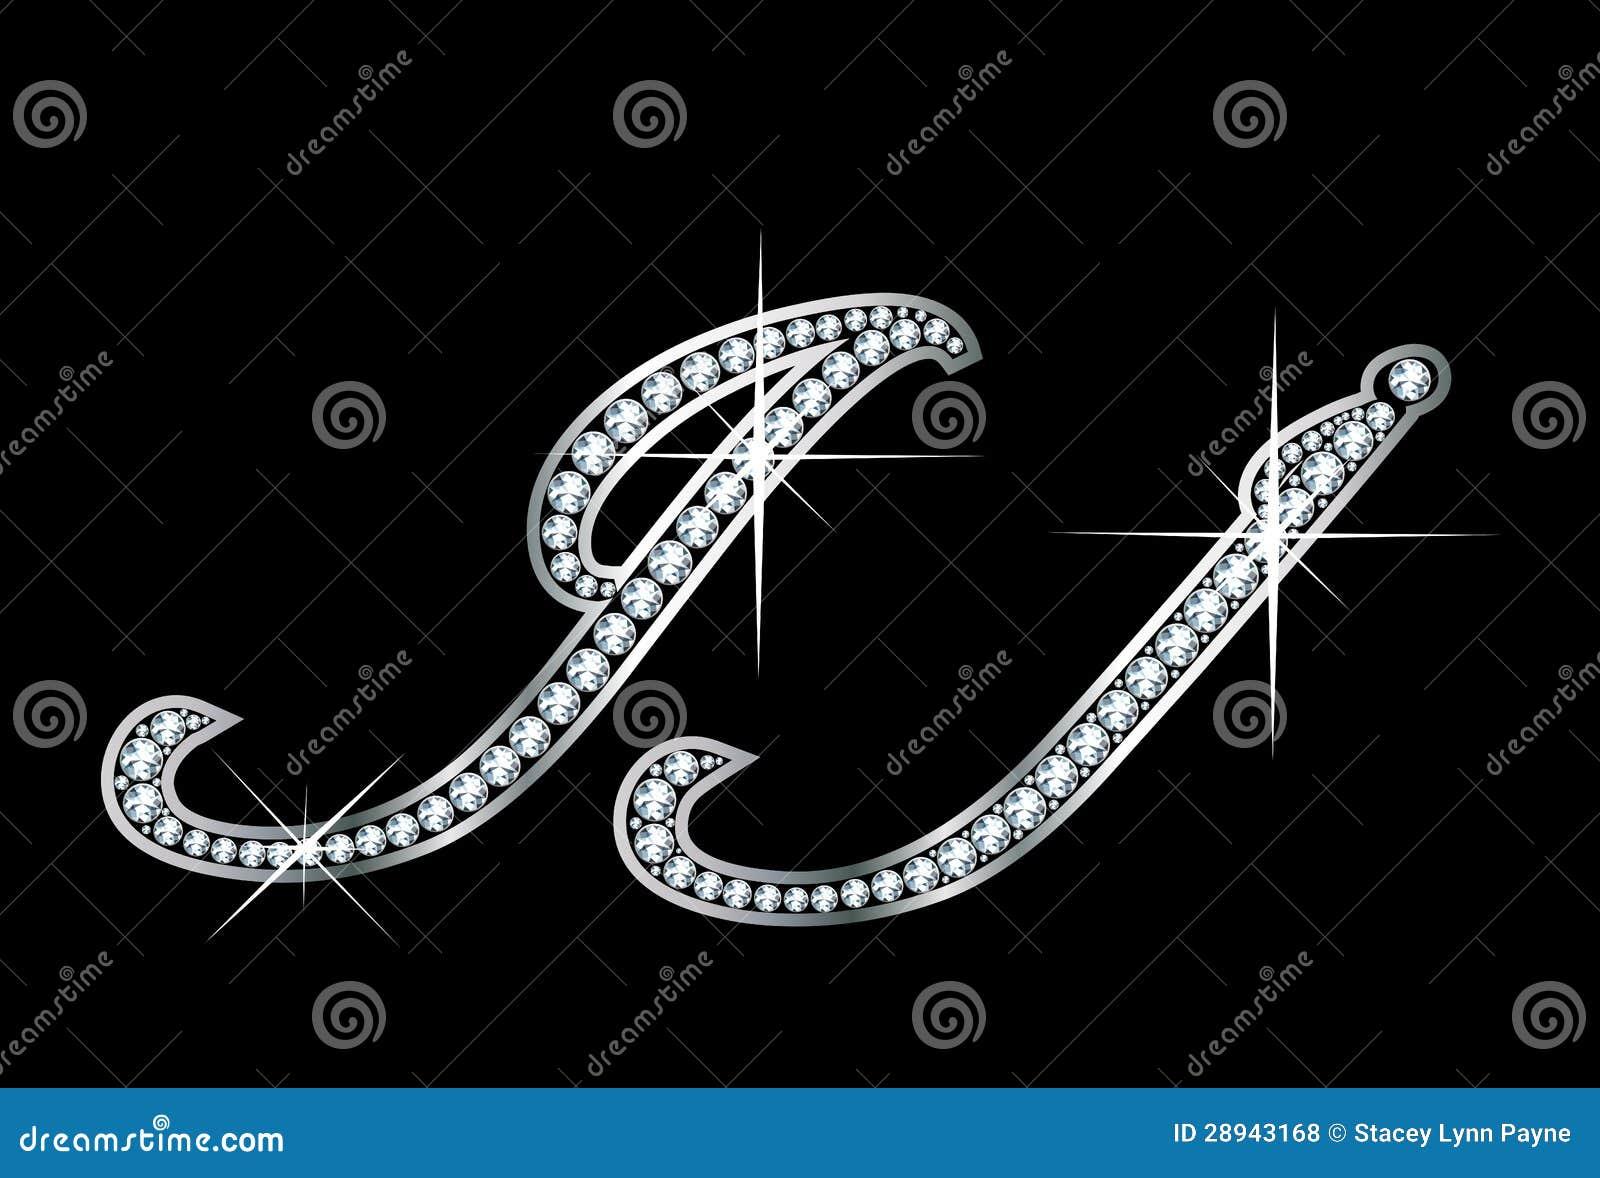 script diamond bling jj letters stock photo